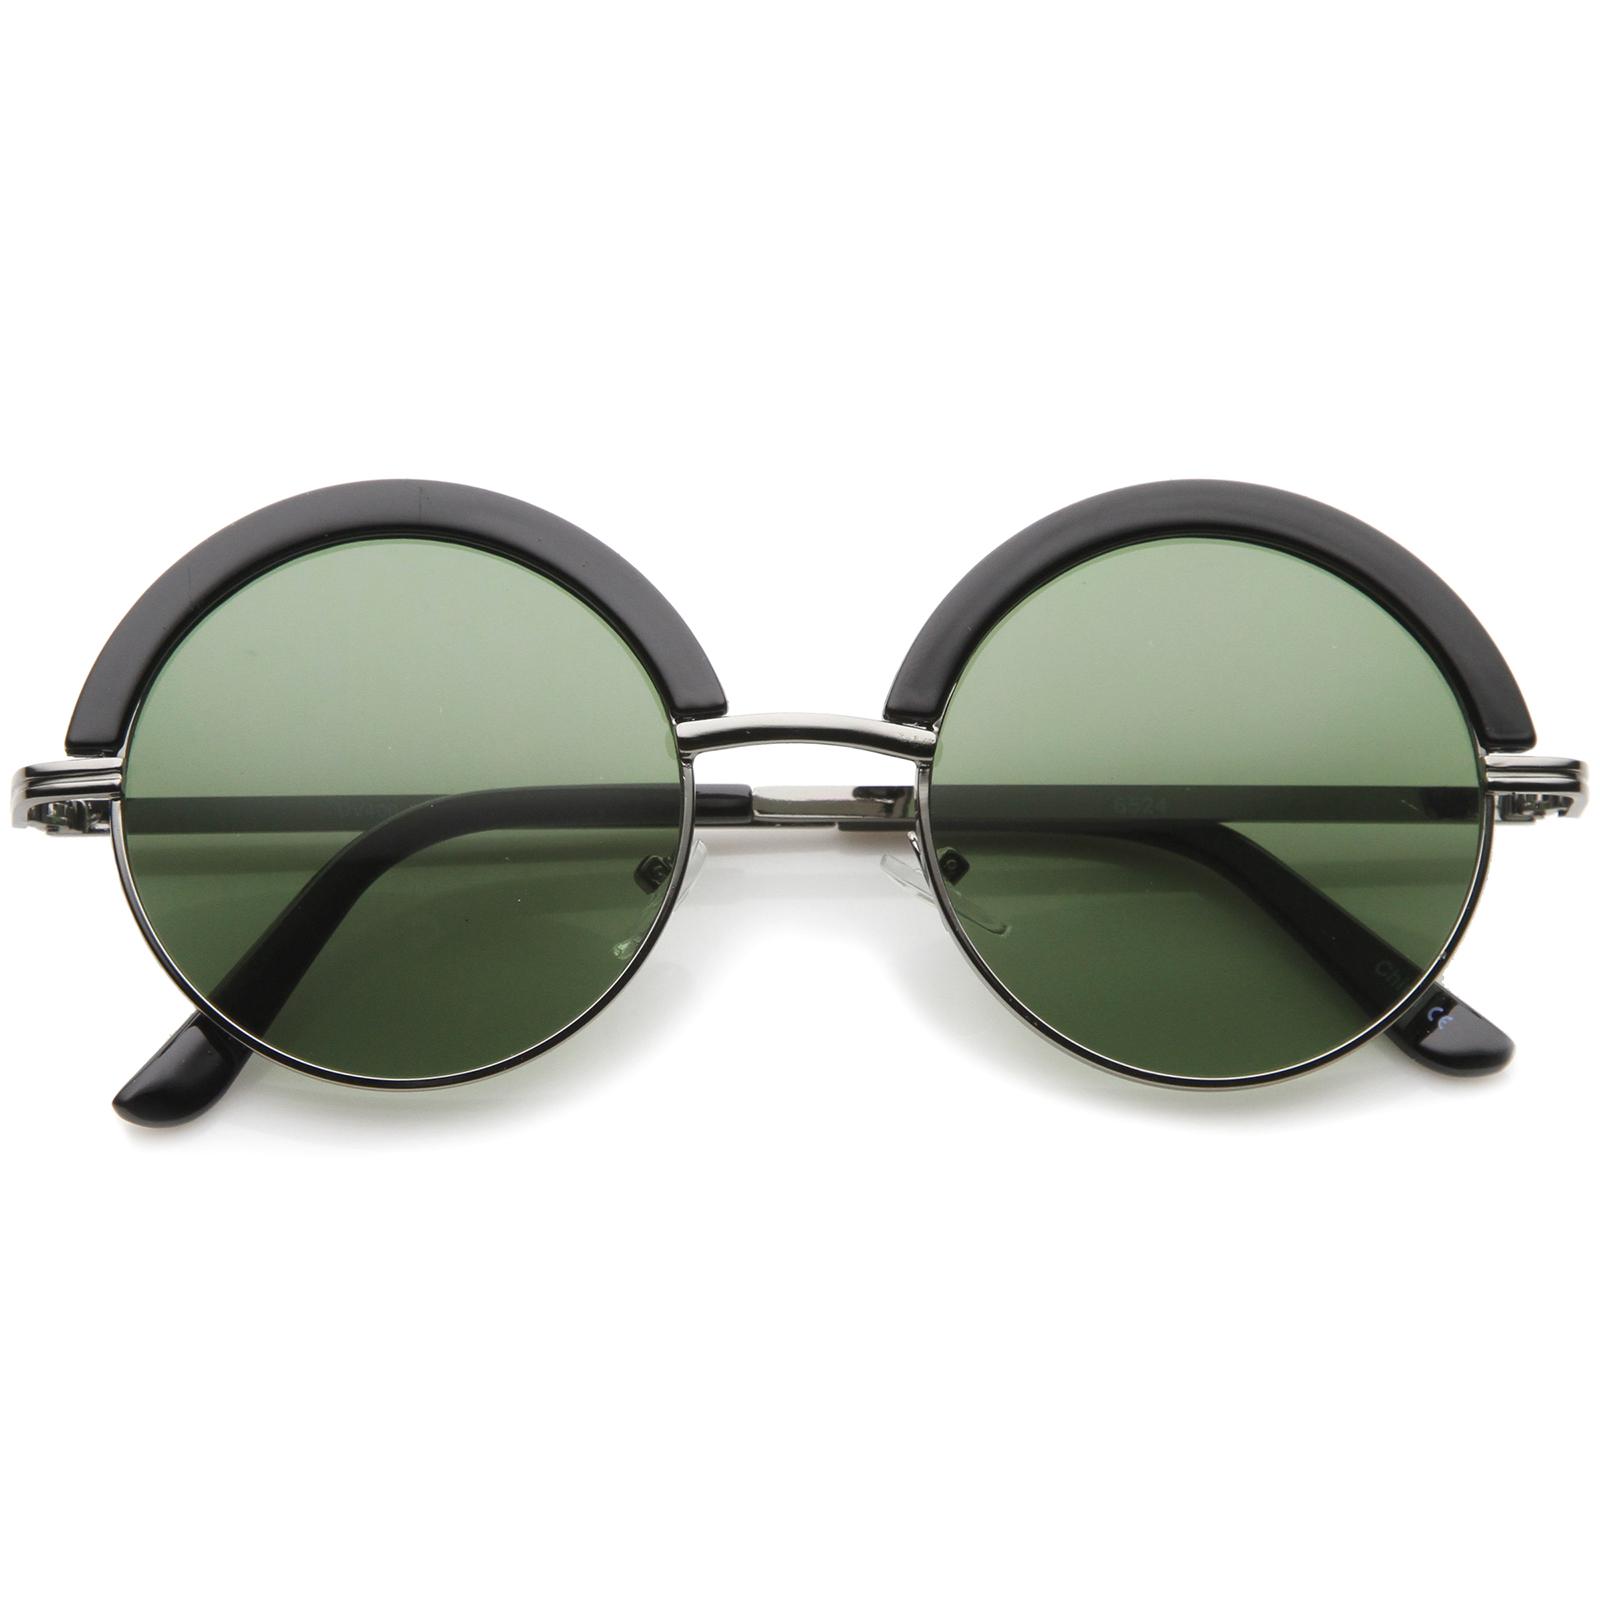 sunglassLA Mod Fashion Oversize Half-Frame Brow Eyelid ...